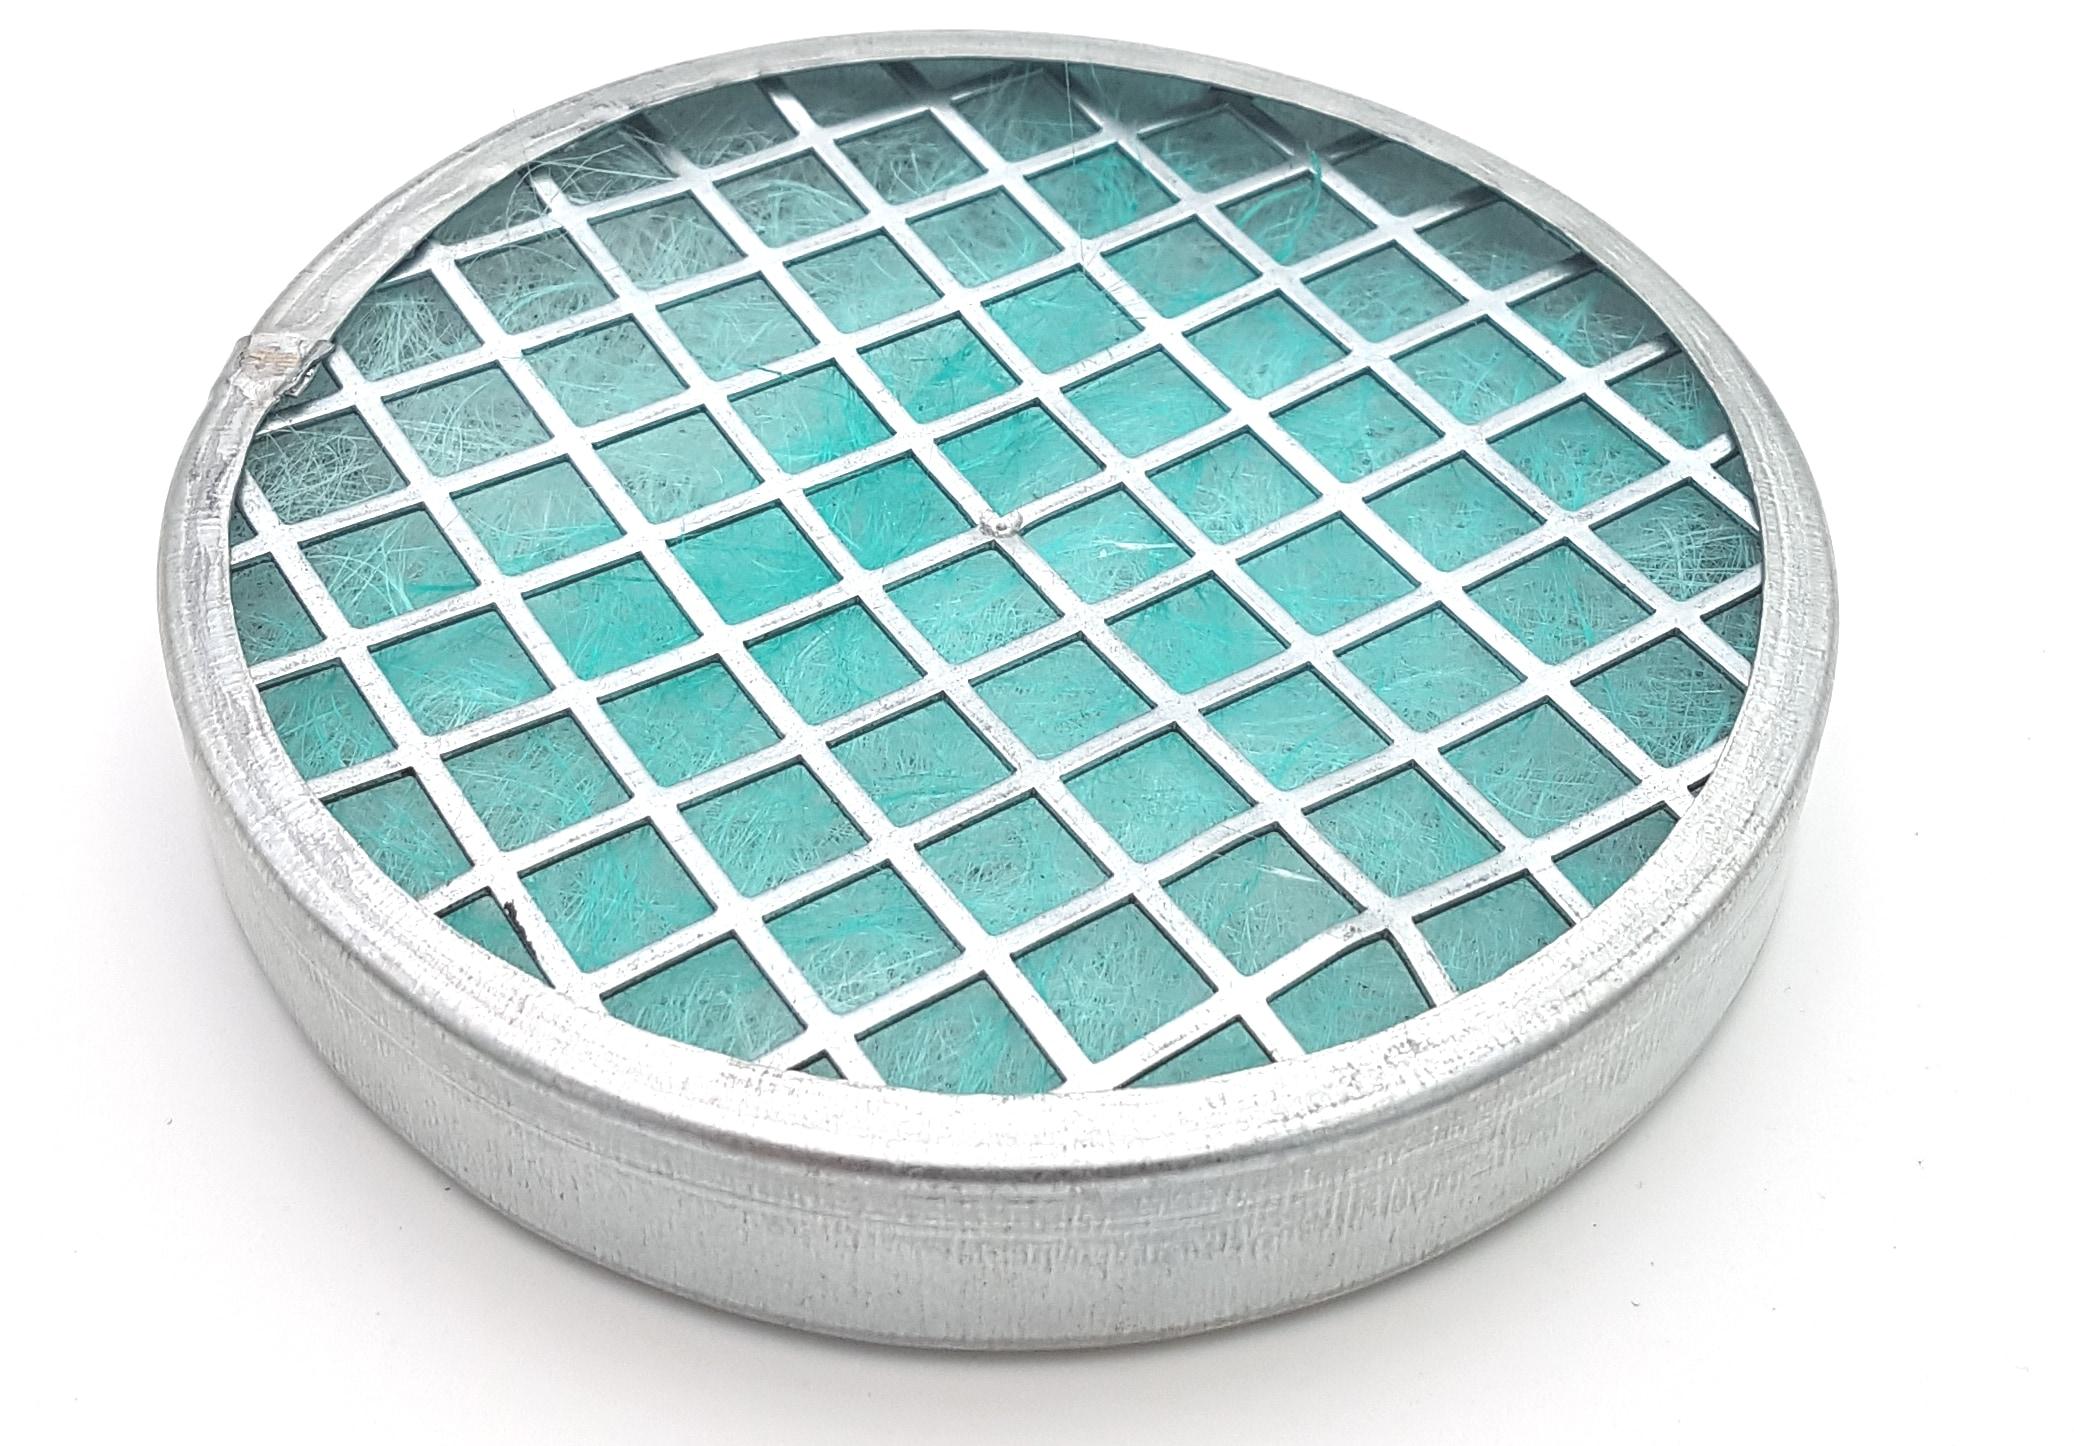 Filterkasette für Rohreinschubfilter Filterklasse G3